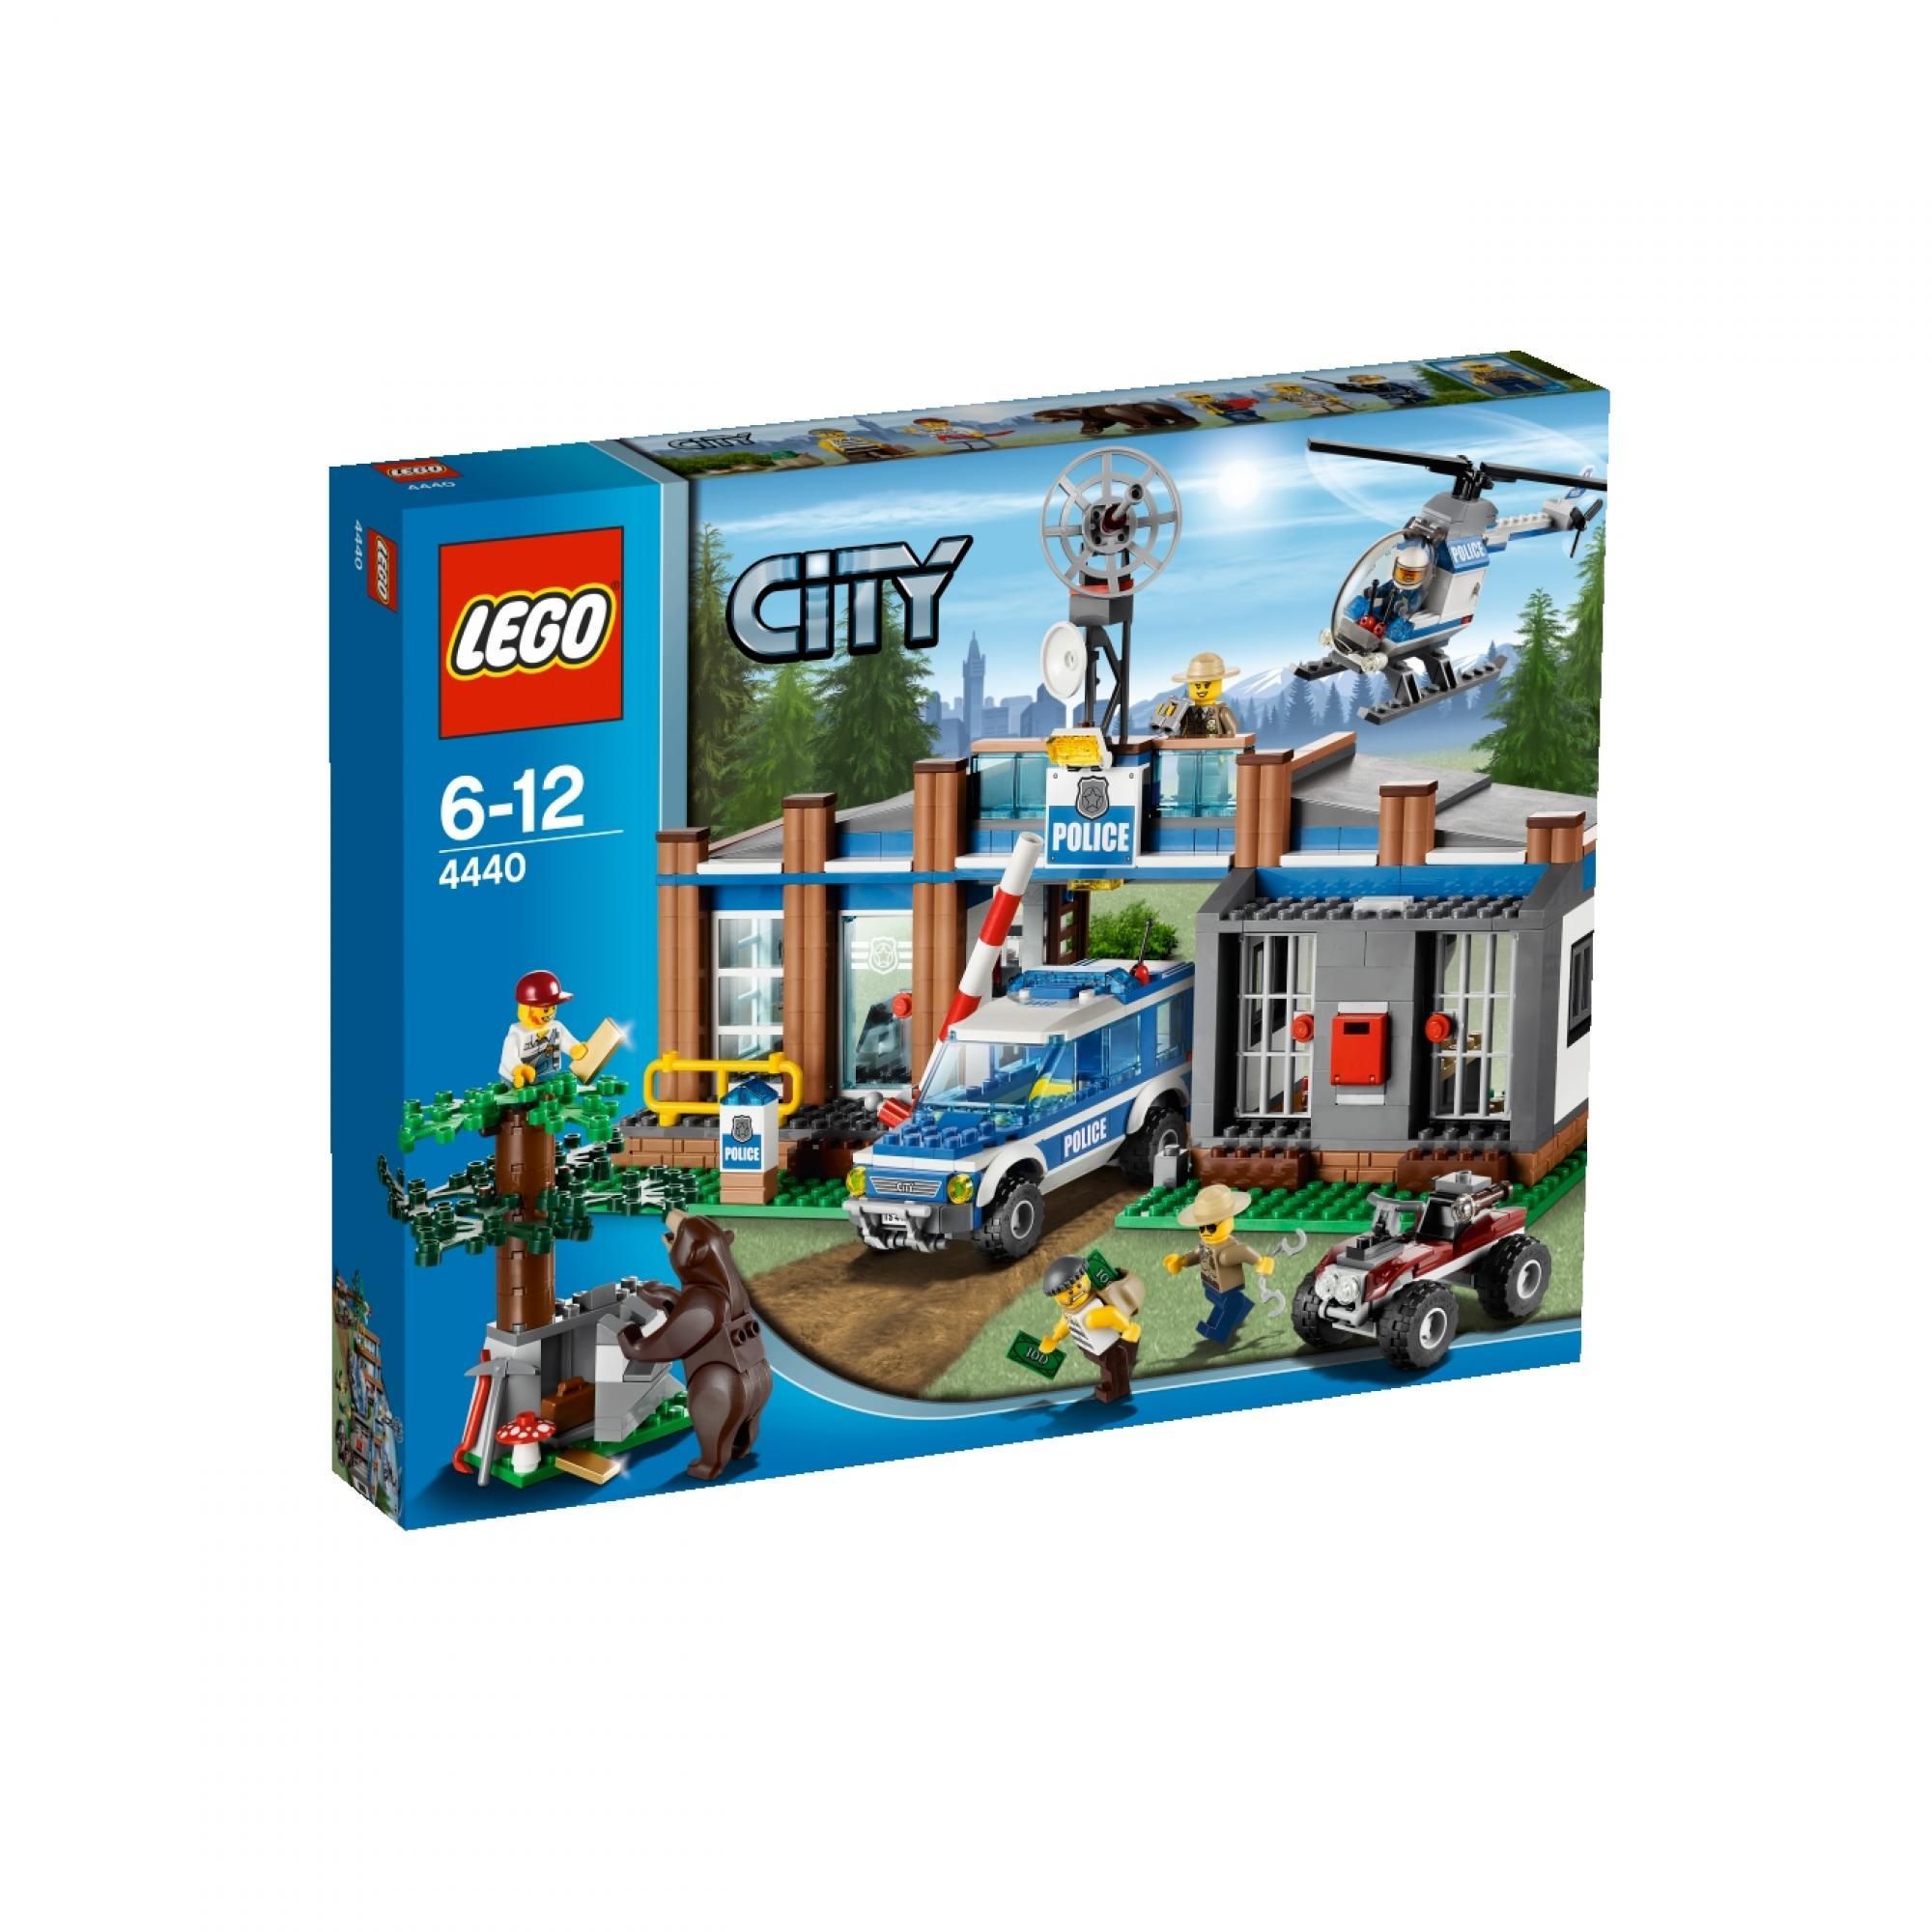 4440 Forest Police Station